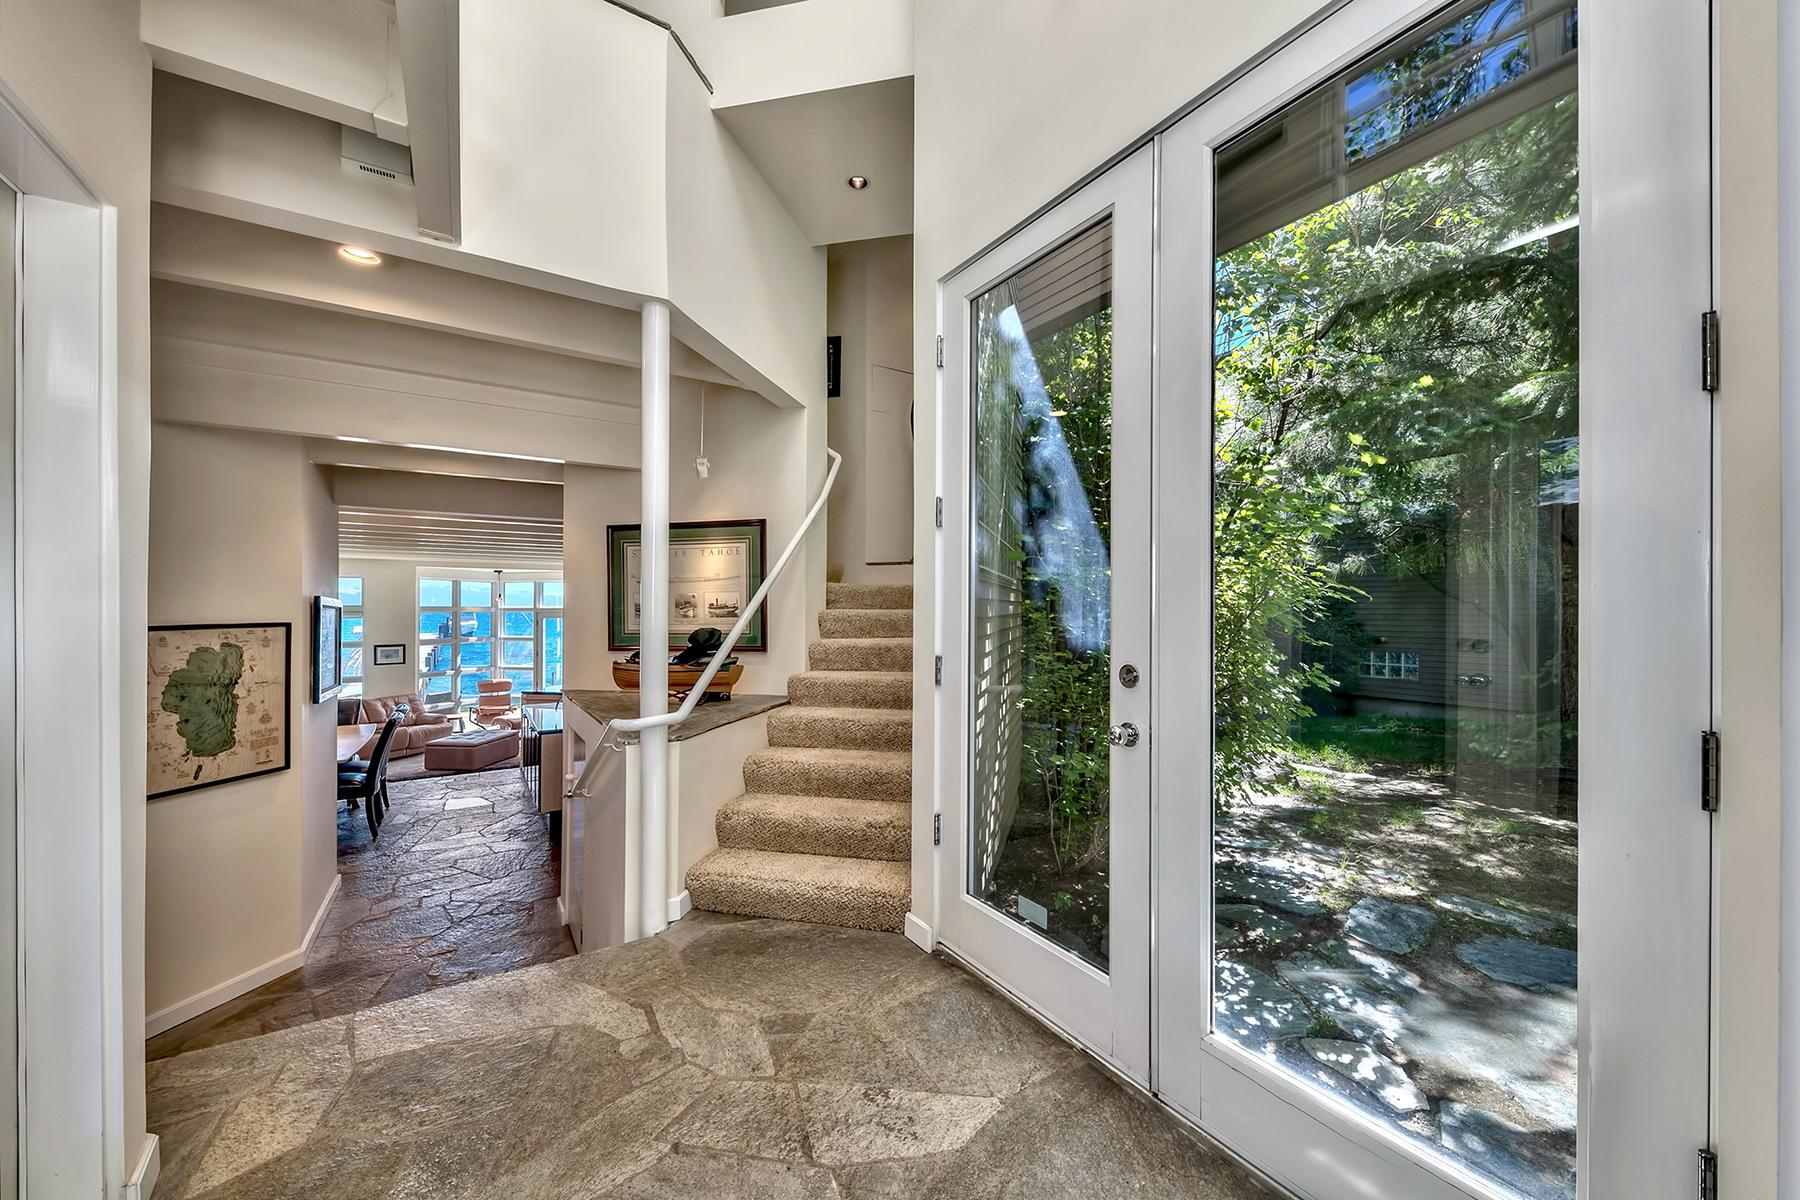 Additional photo for property listing at 8734 Brockway Vista Avenue, Kings Beach, CA 96143 8734 Brockway Vista Avenue Kings Beach, California 96143 United States